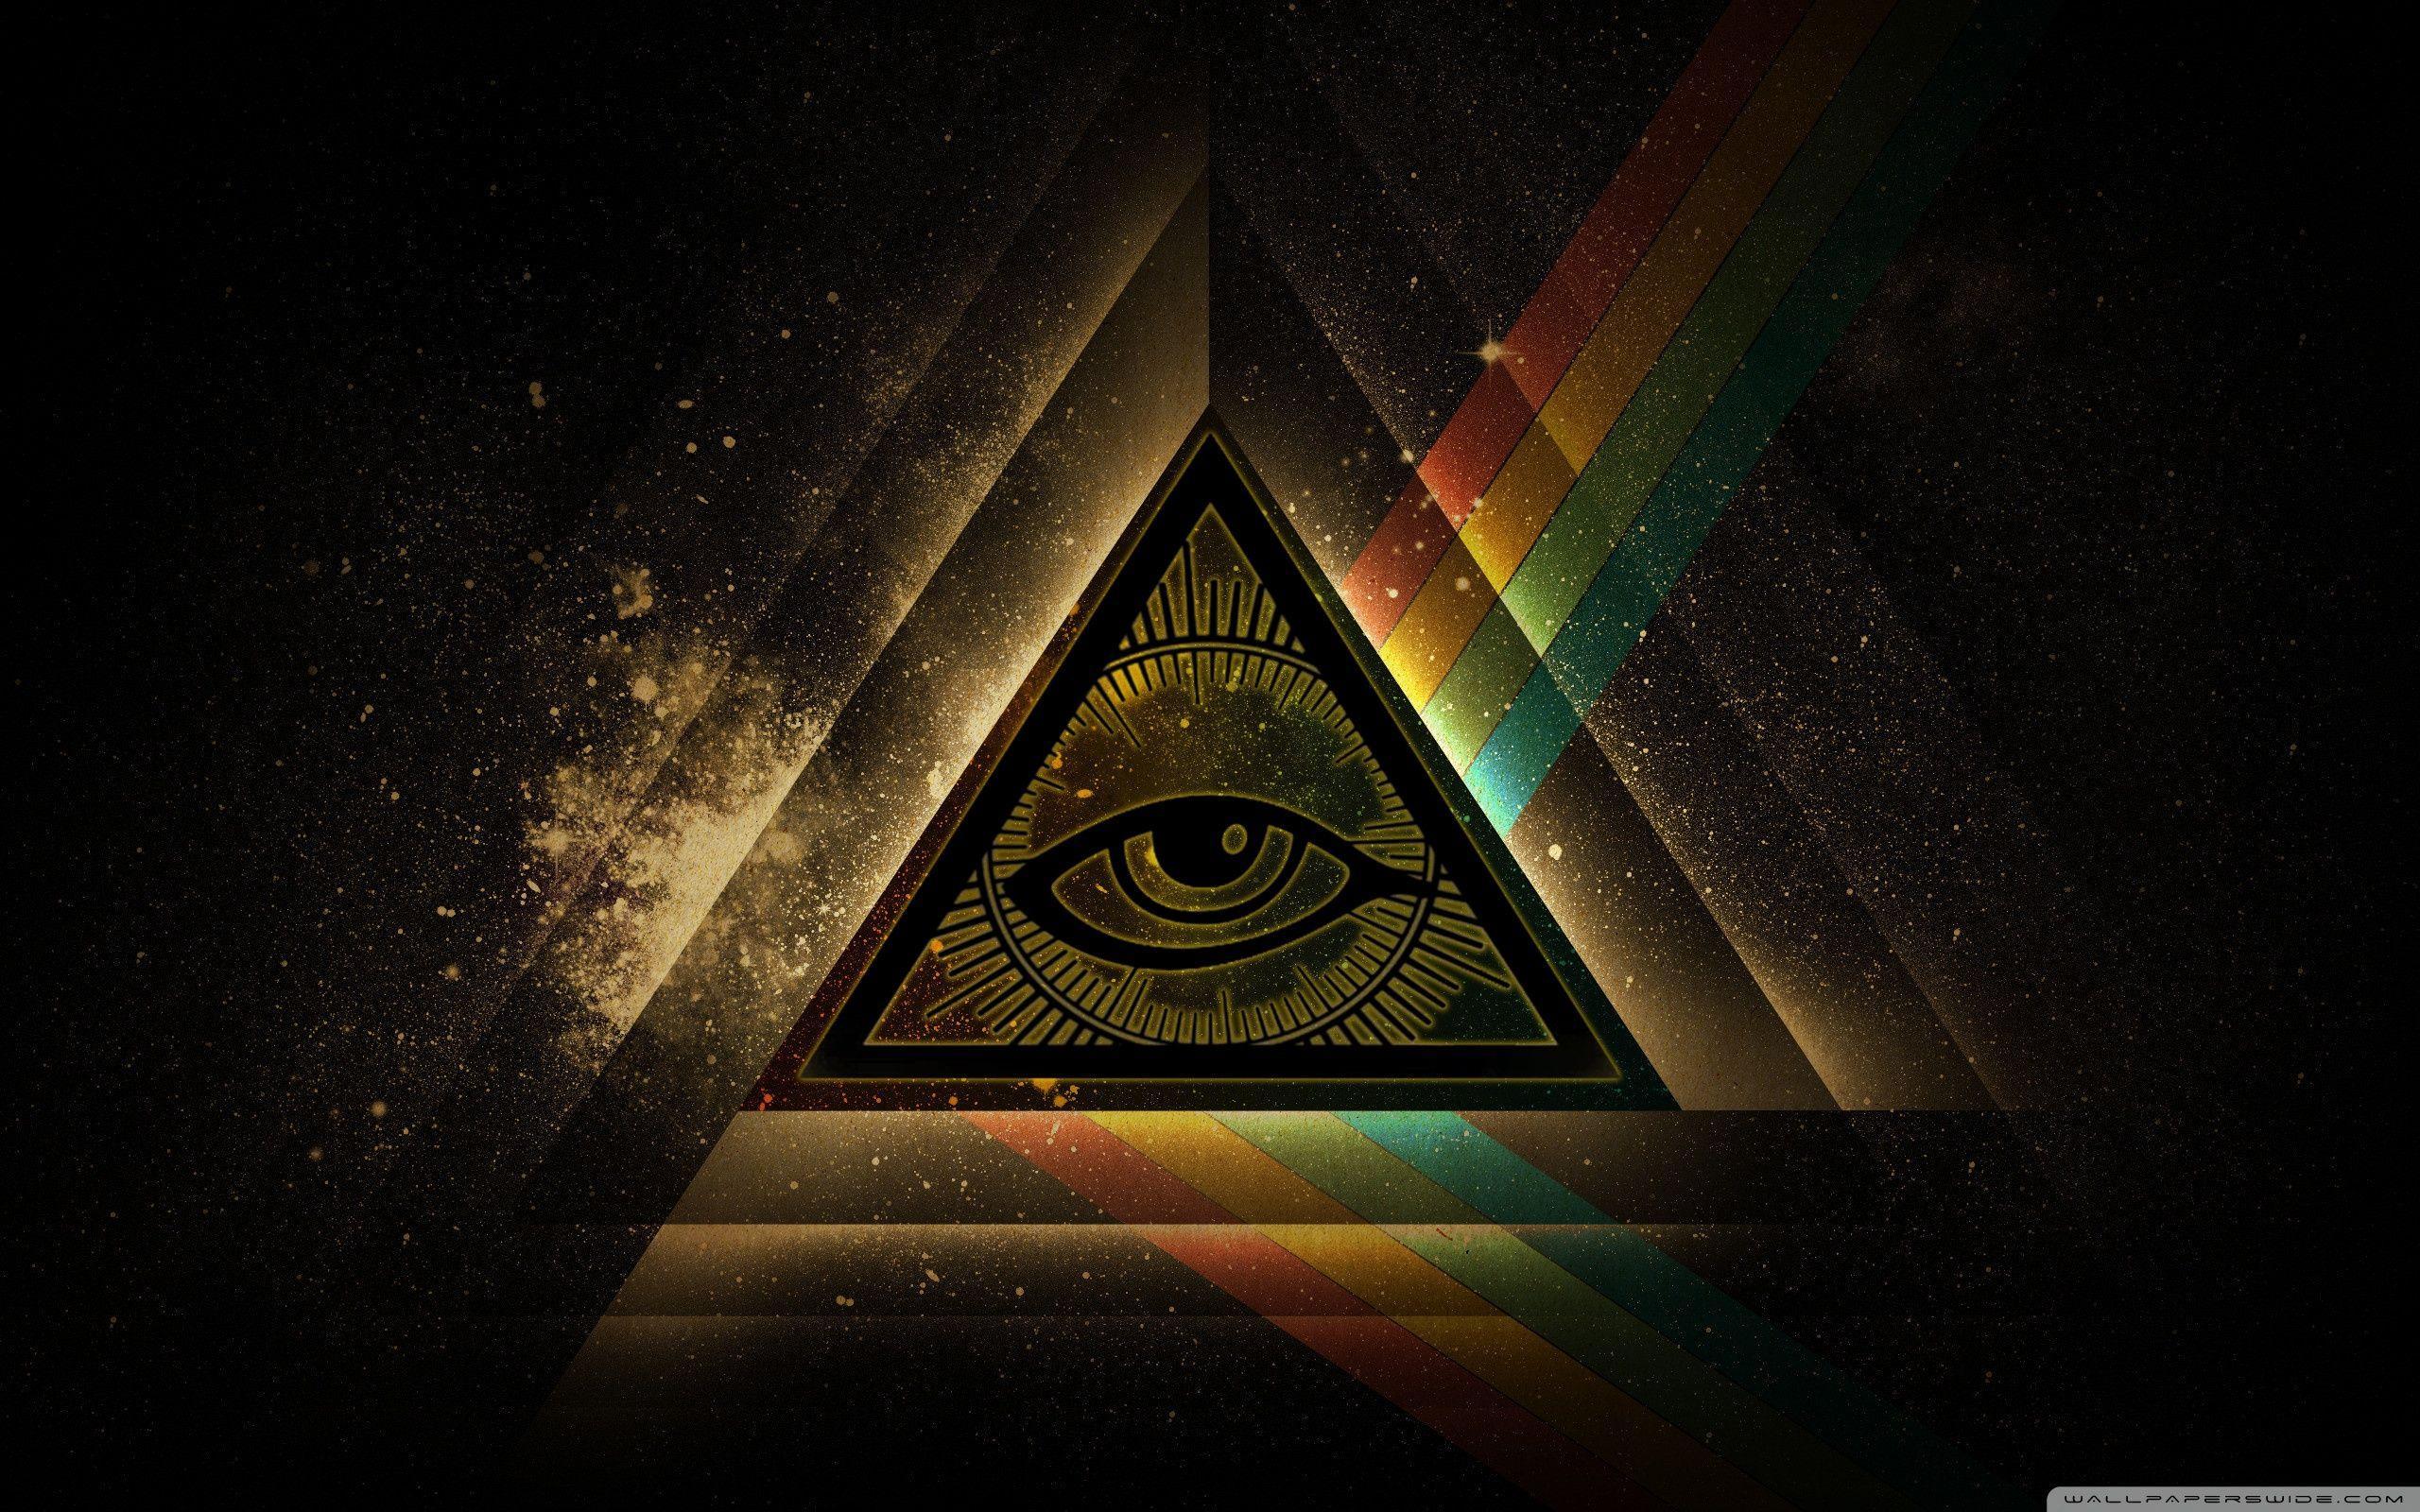 Eye Of Horus Wallpapers Top Free Eye Of Horus Backgrounds Wallpaperaccess